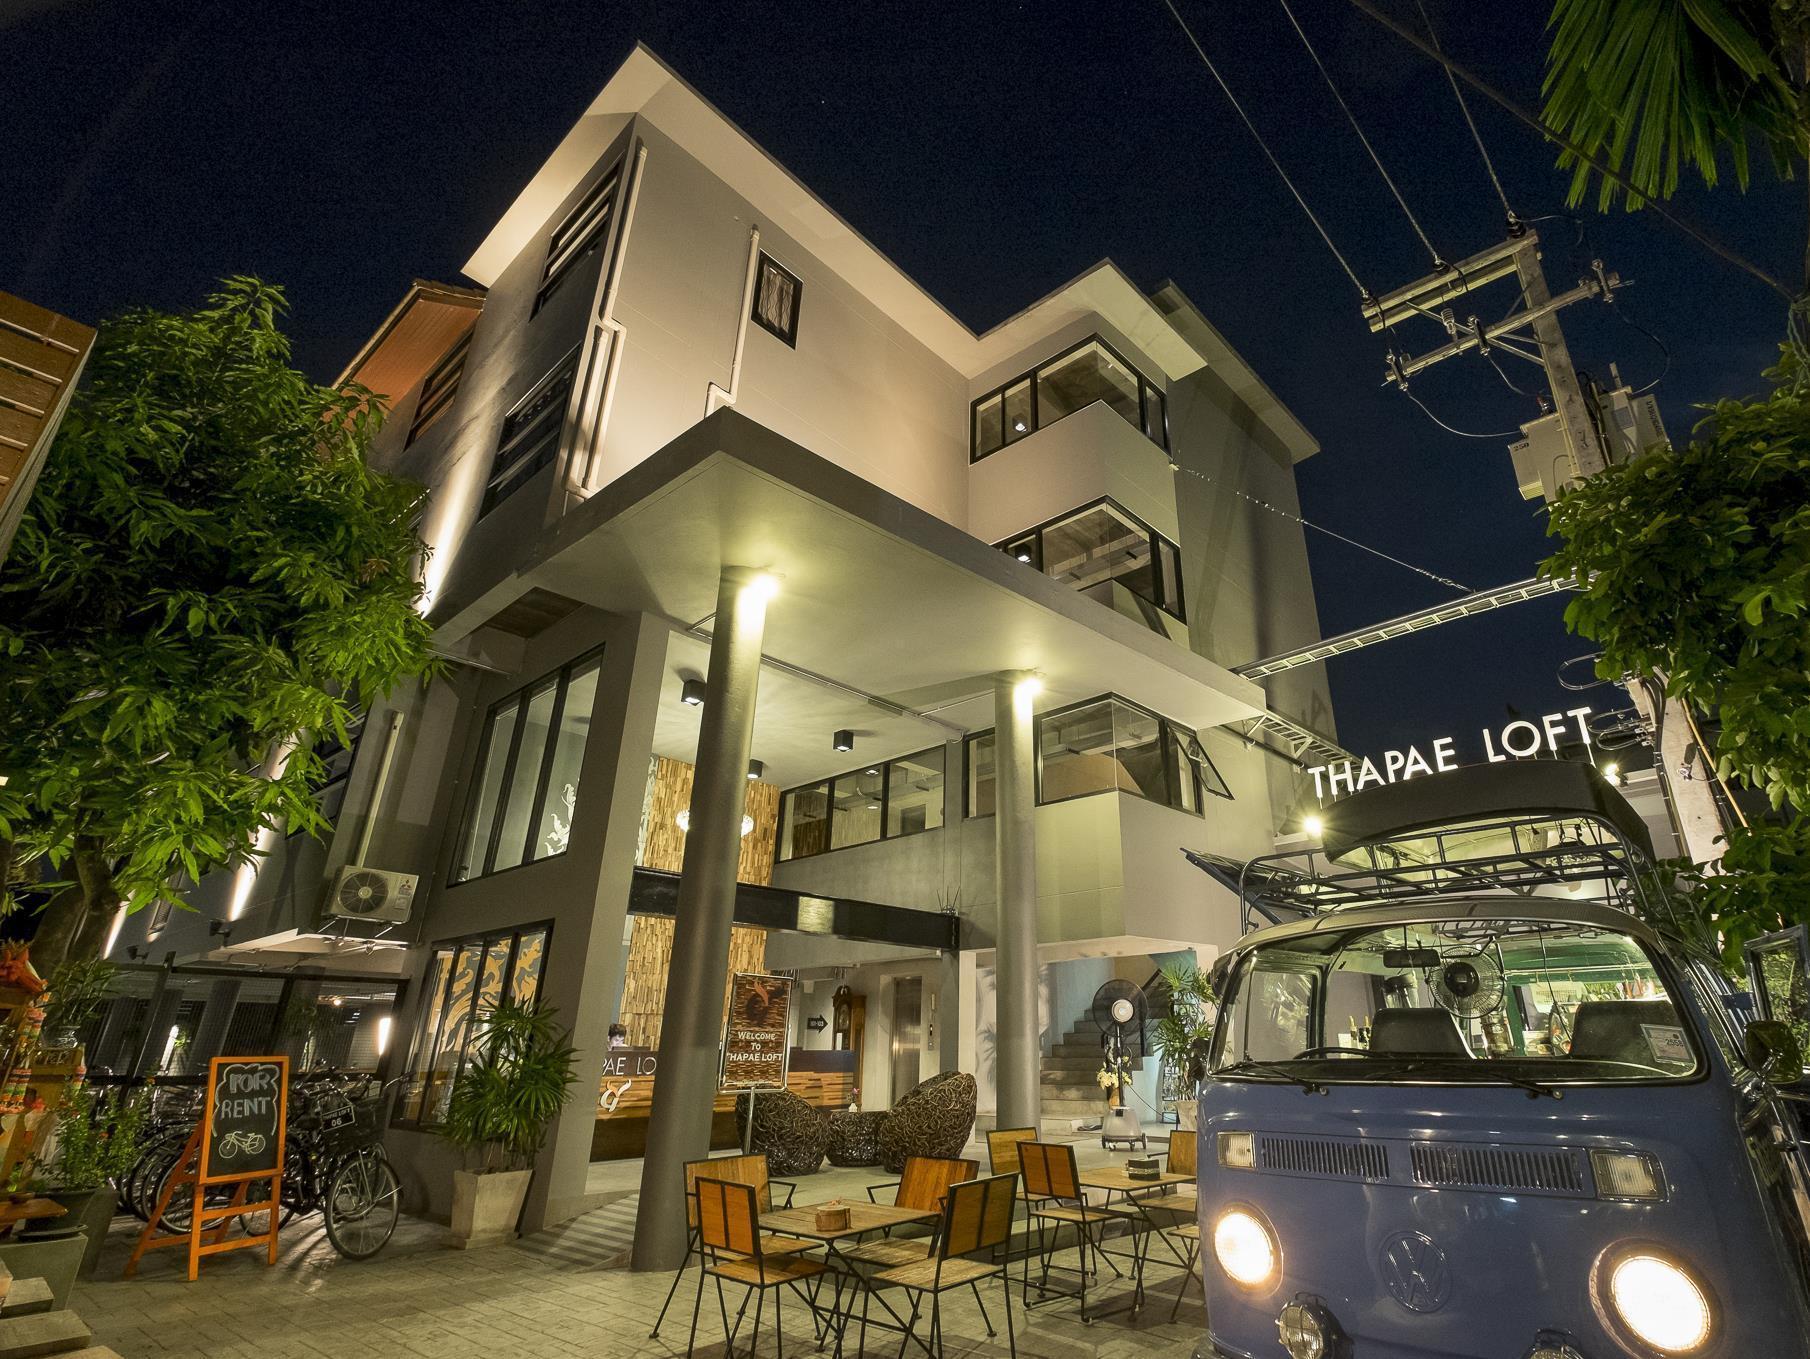 Thapae Loft Hotel ท่าแพ ลอฟต์ โฮเต็ล